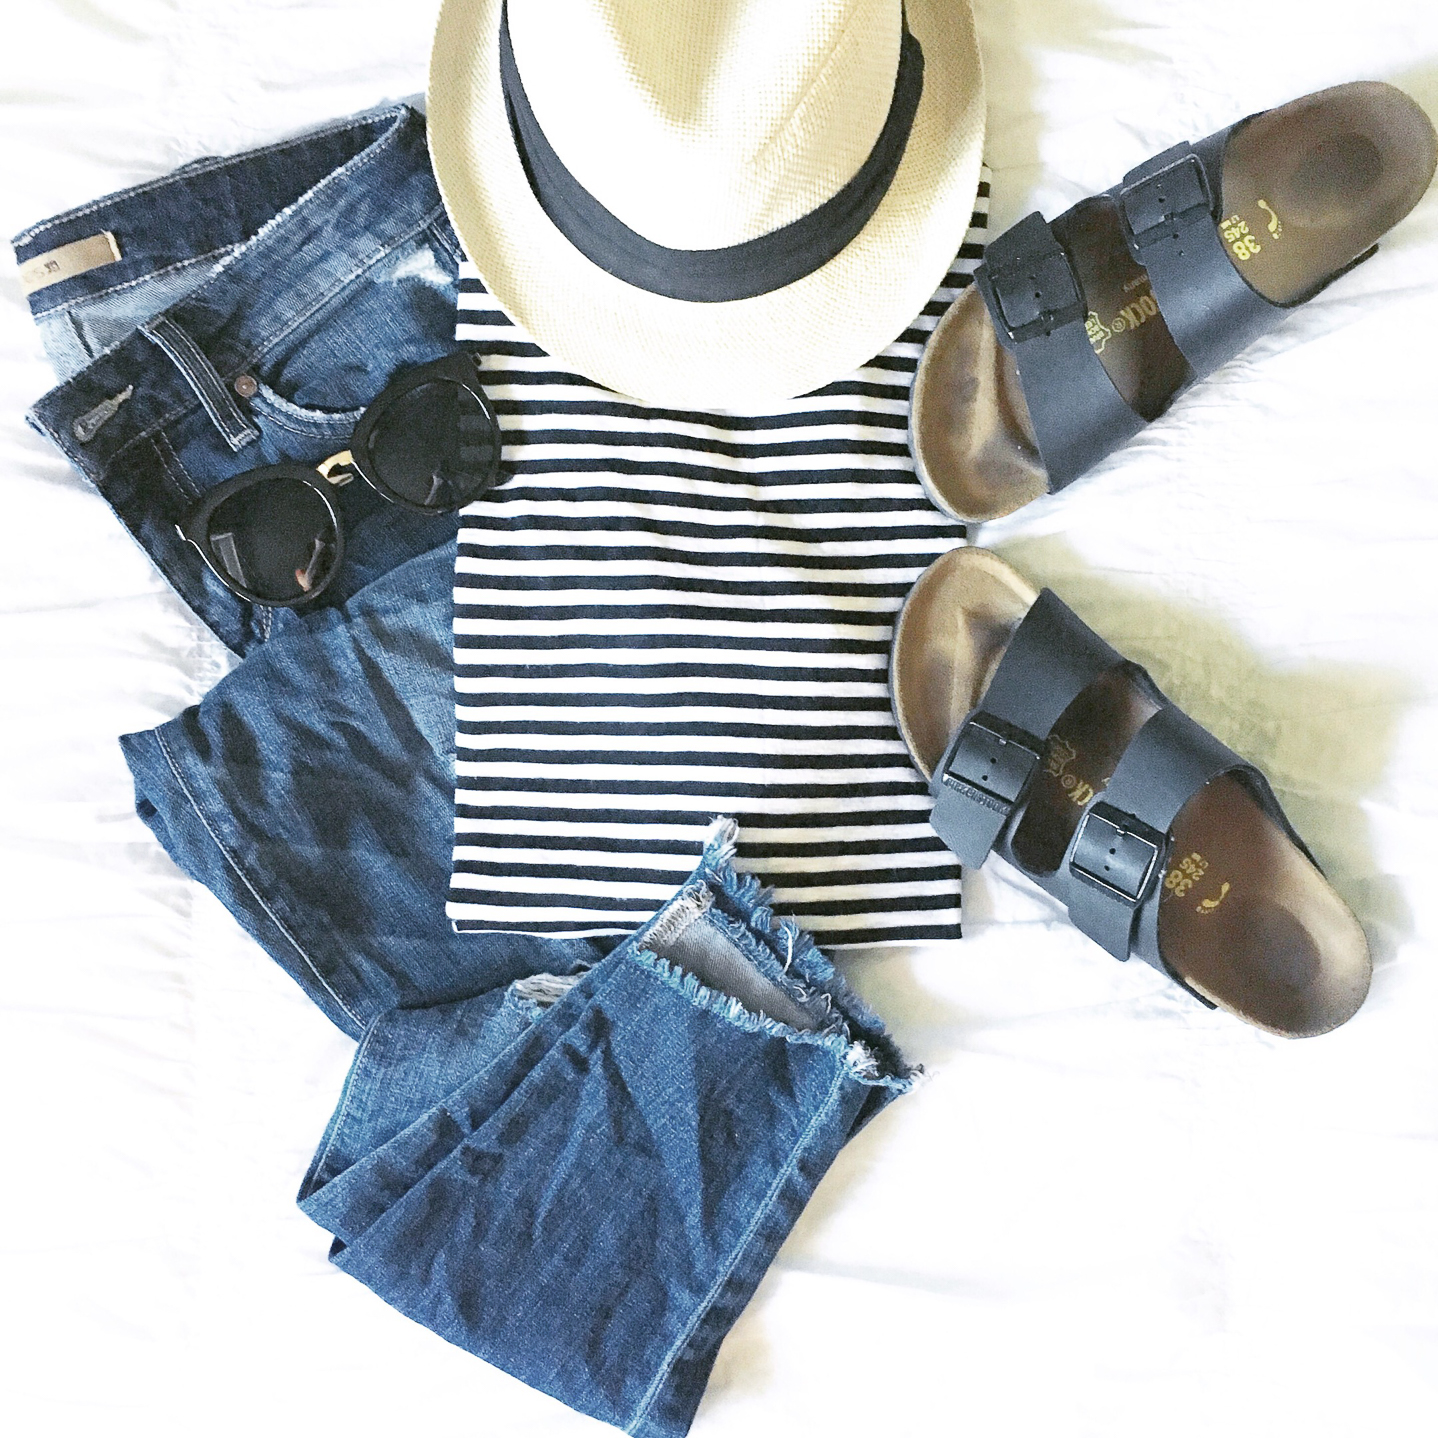 my favorite outfits for summer, Instagram, life lately, casual flatlay stripes denim birkenstocks- edora